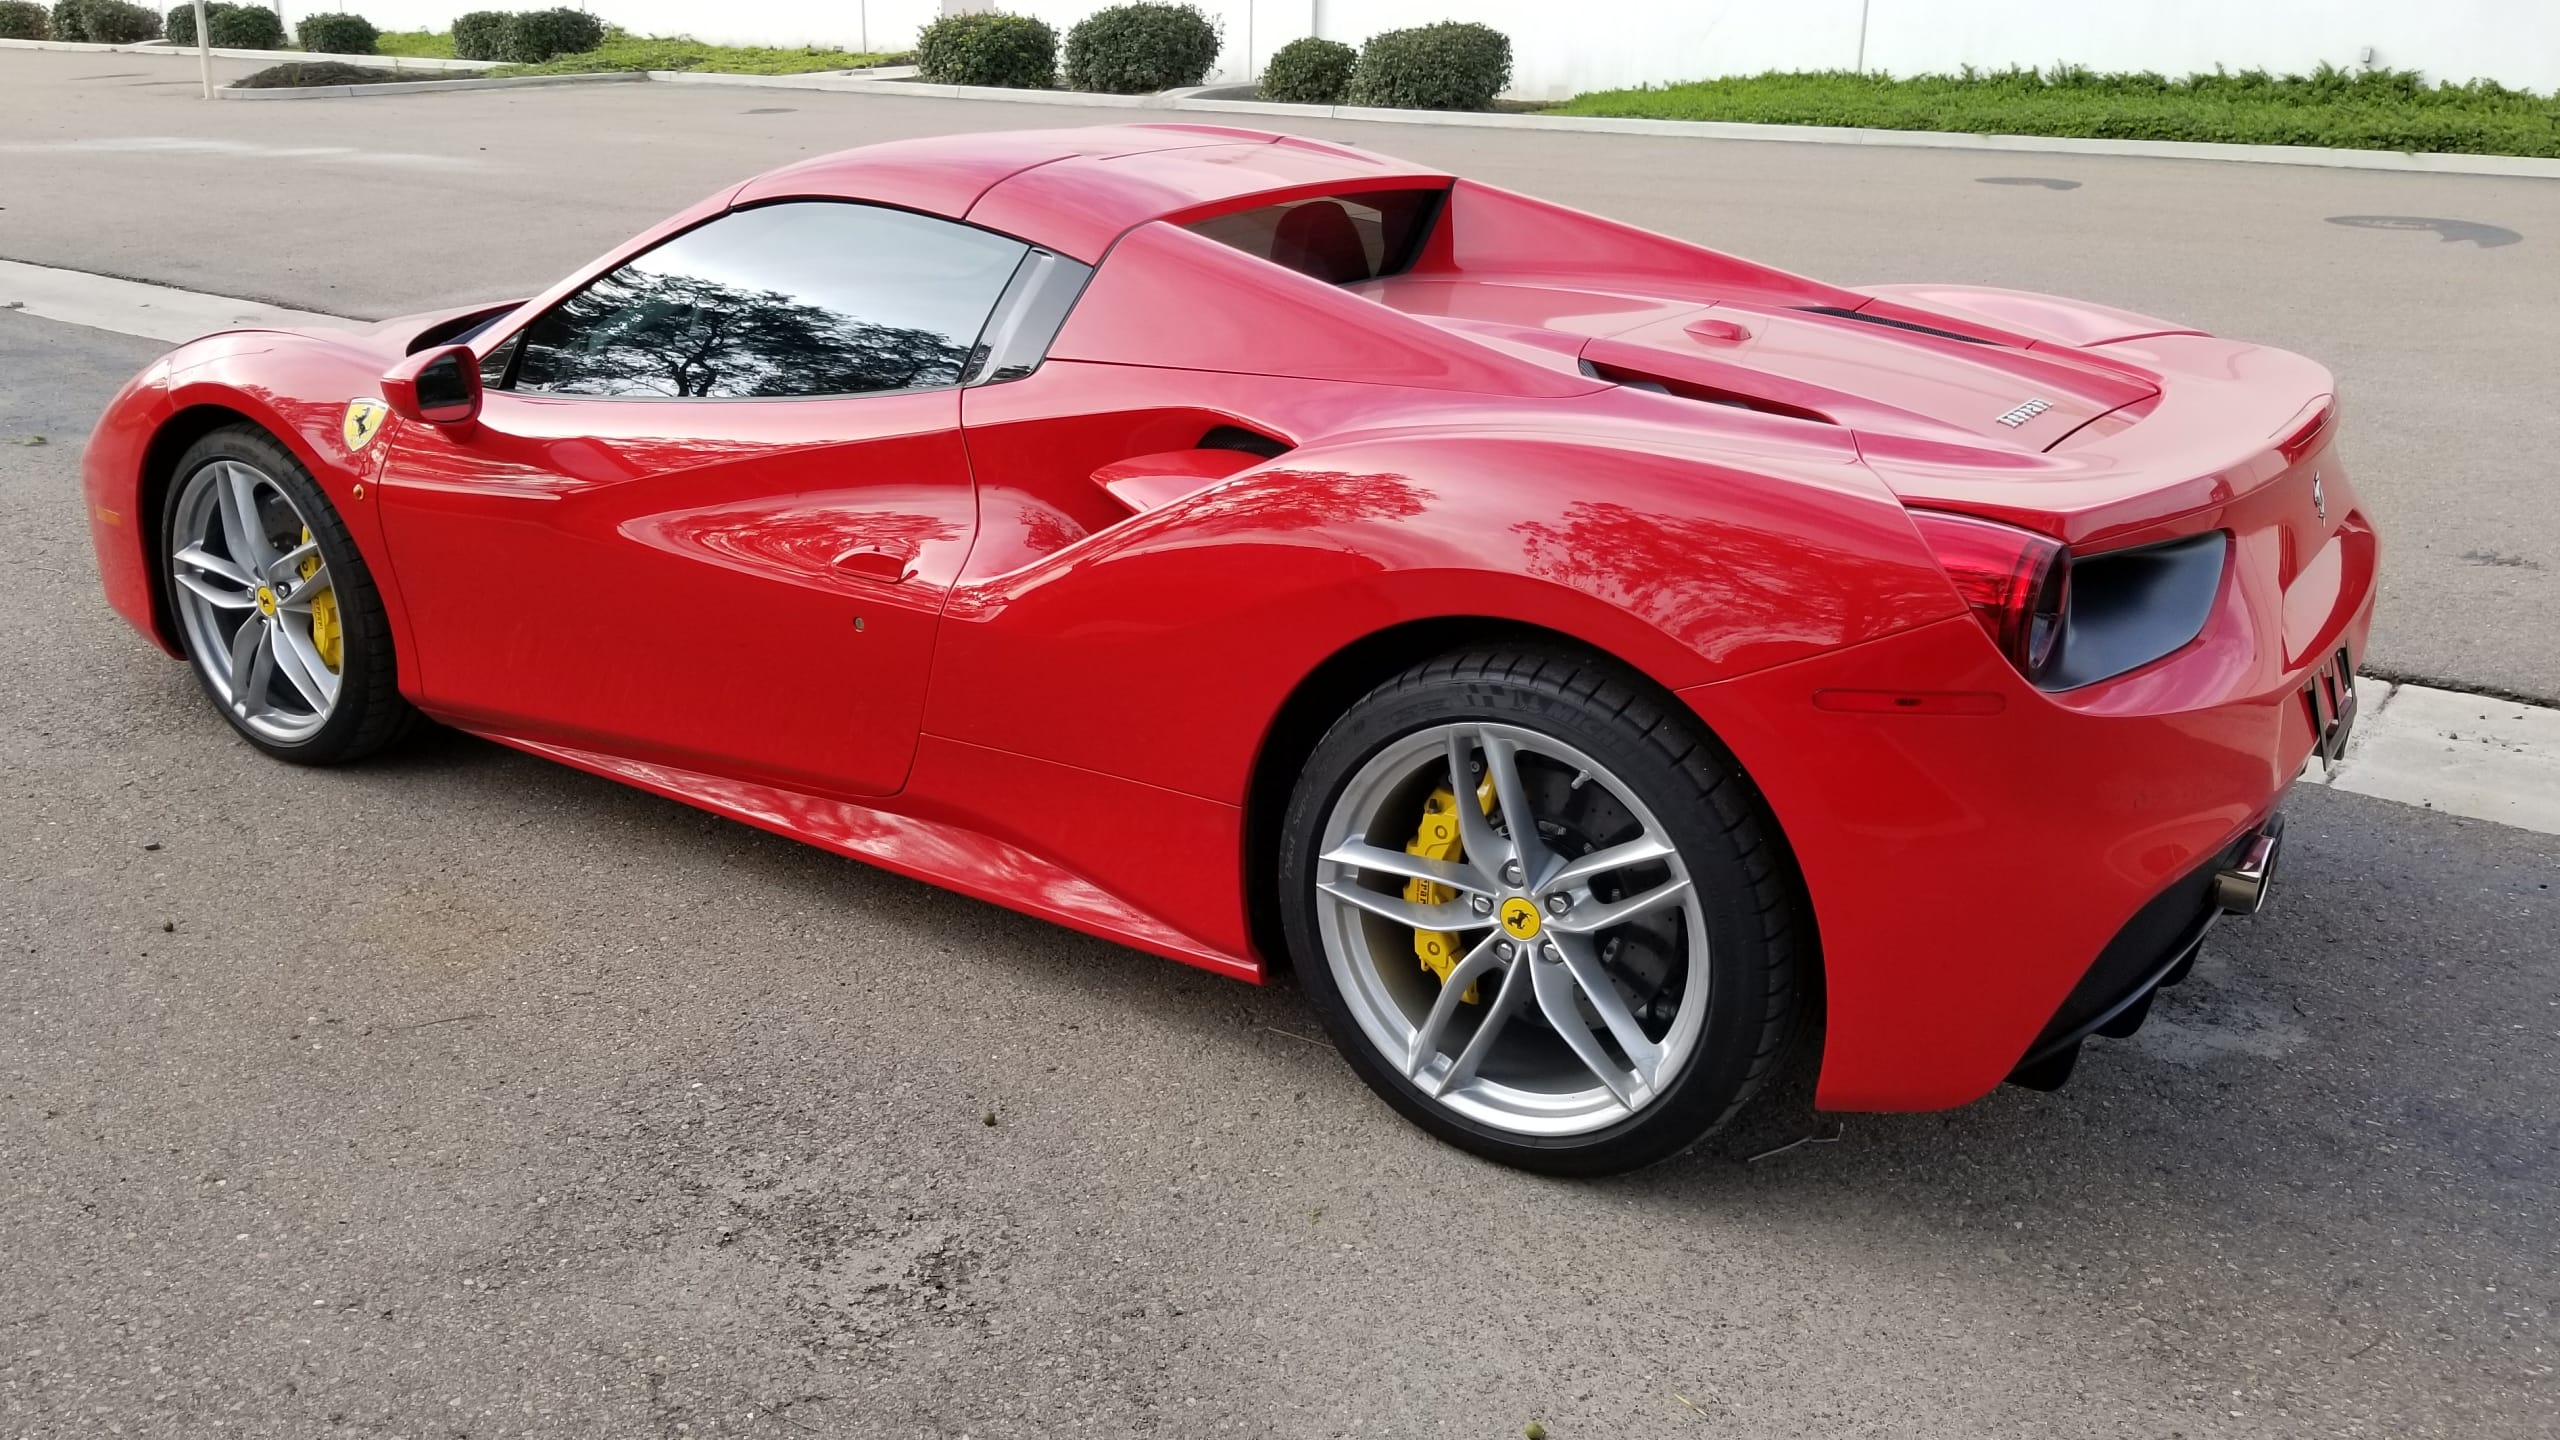 2018 Ferrari 488 Spyder (7)